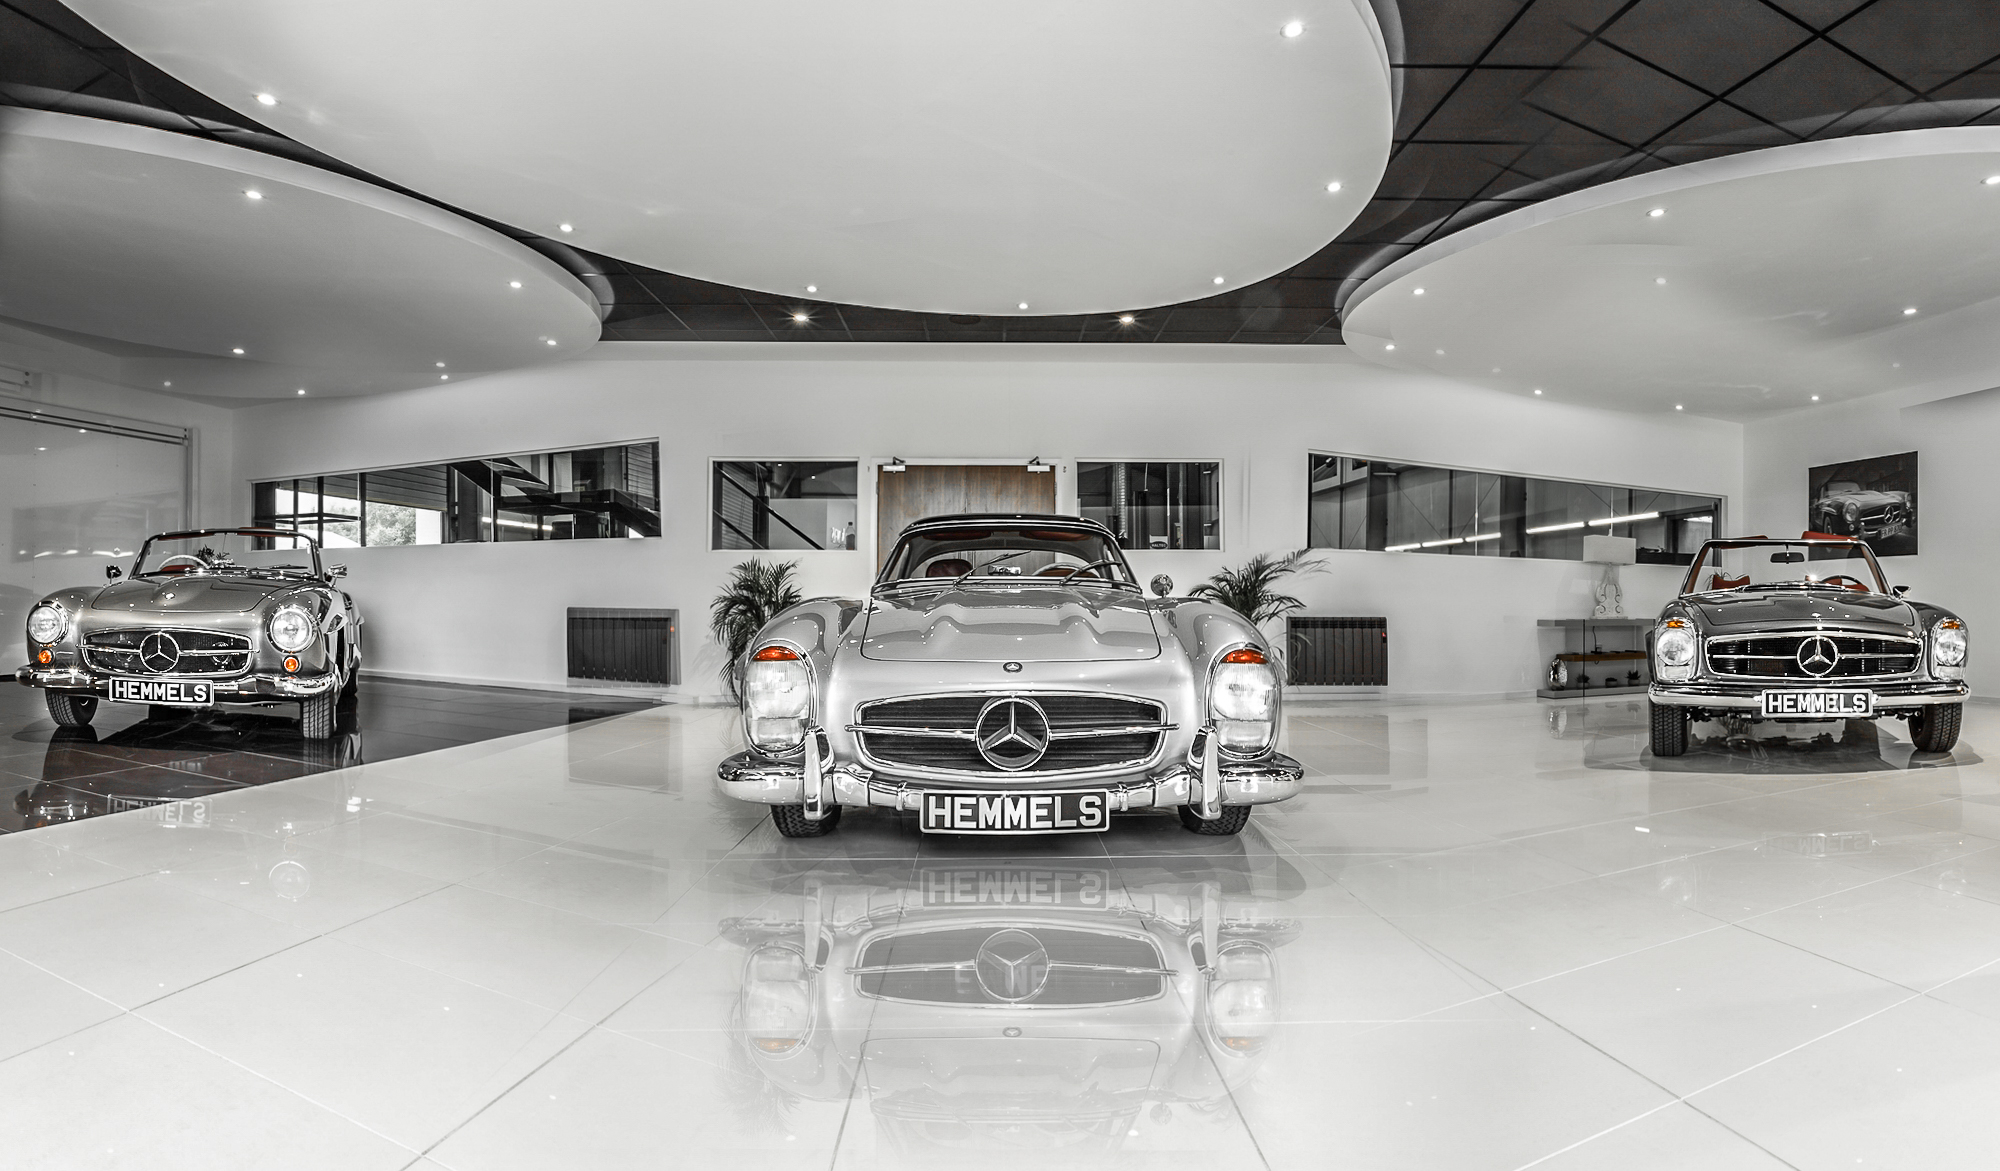 Mercedes 300SL, 280SL and 190SL in the Hemmels showroom